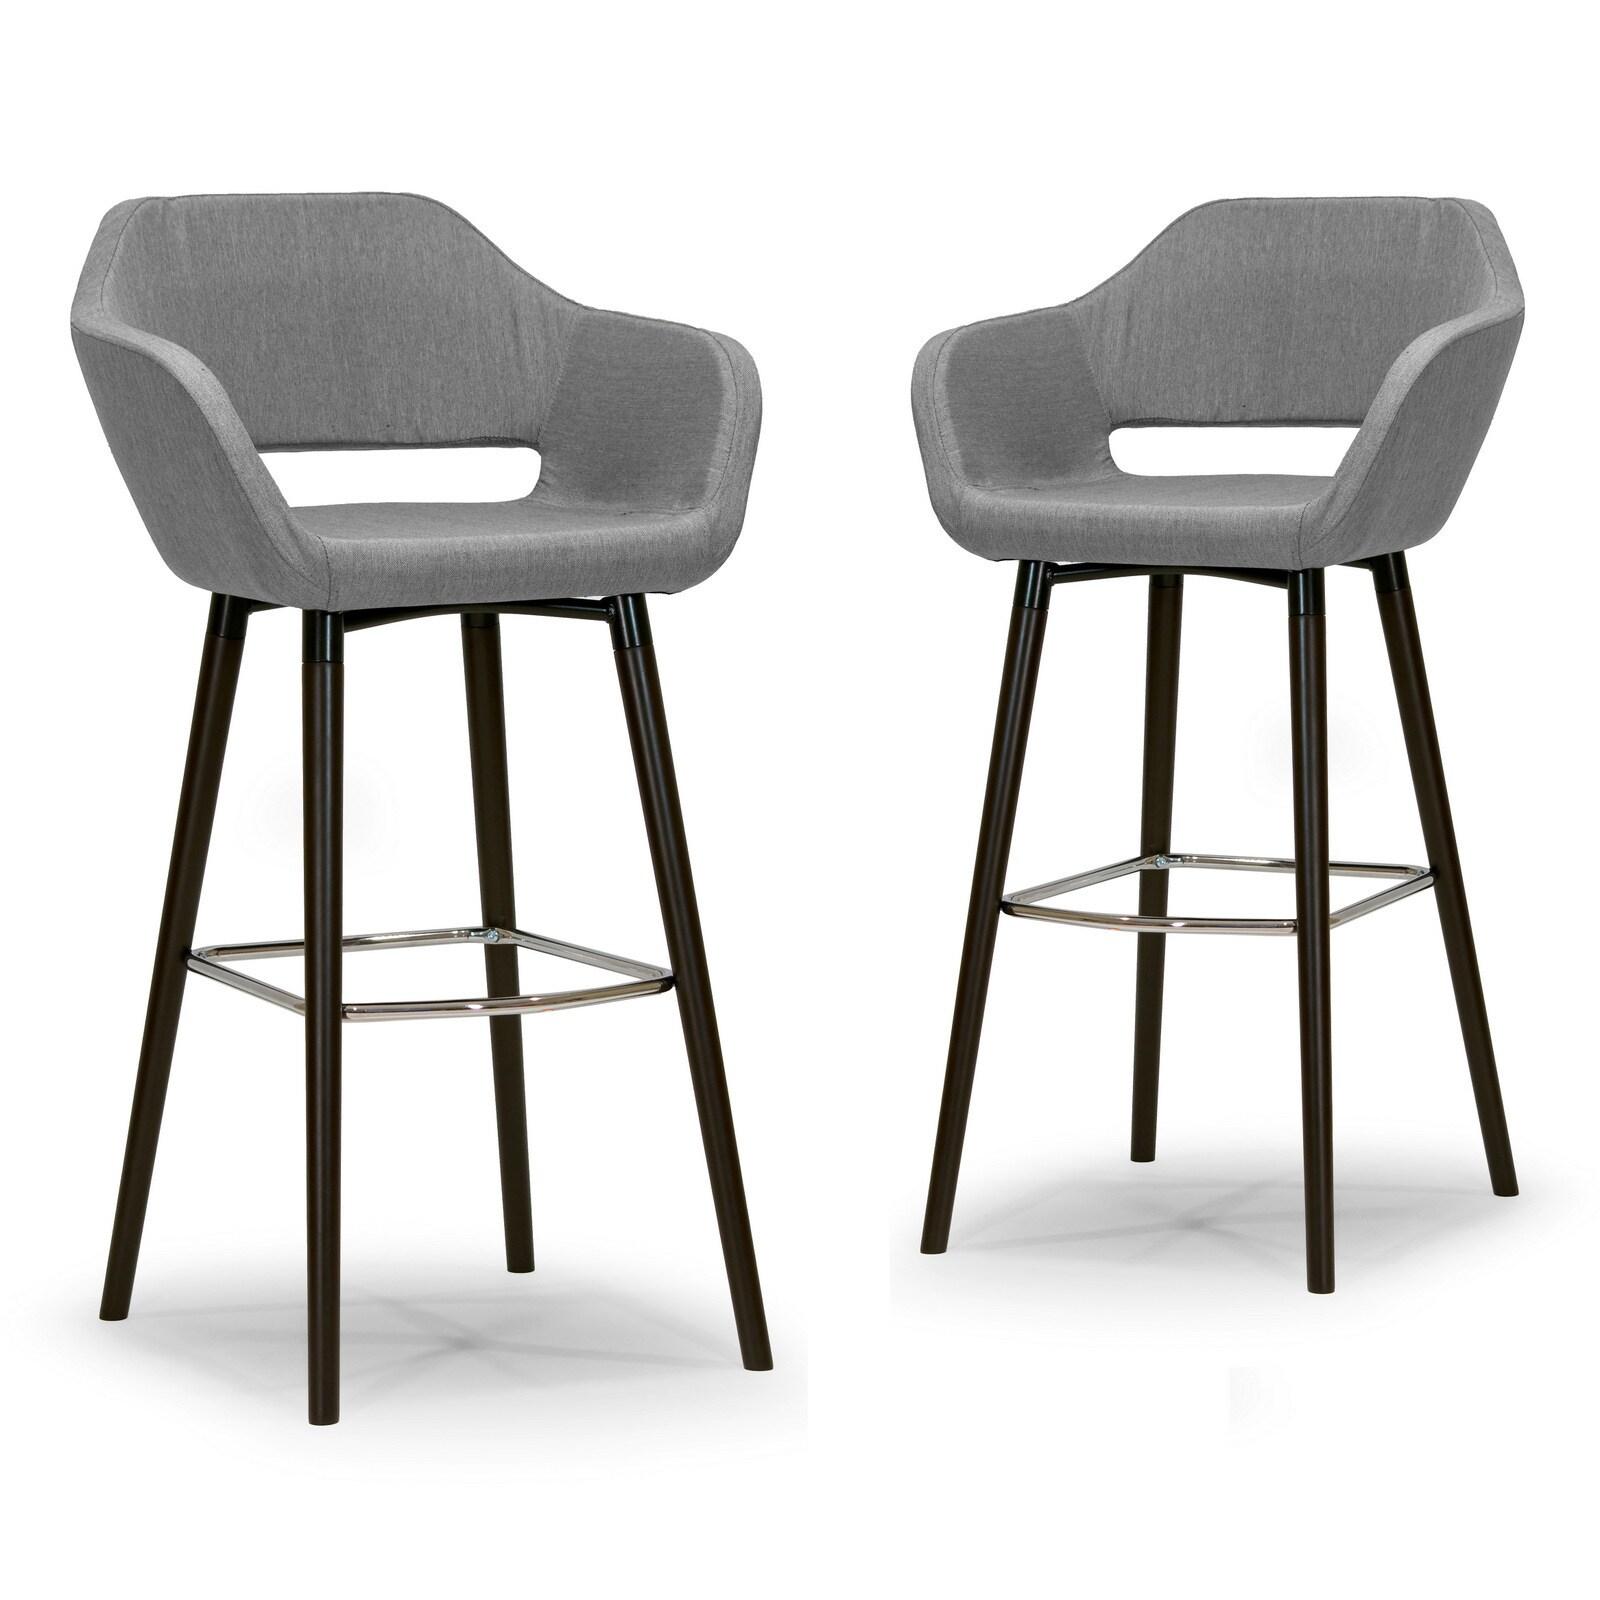 Modern Grey Bar Stools.Adel Modern Grey Fabric Bar Stool With Beech Legs Set Of 2